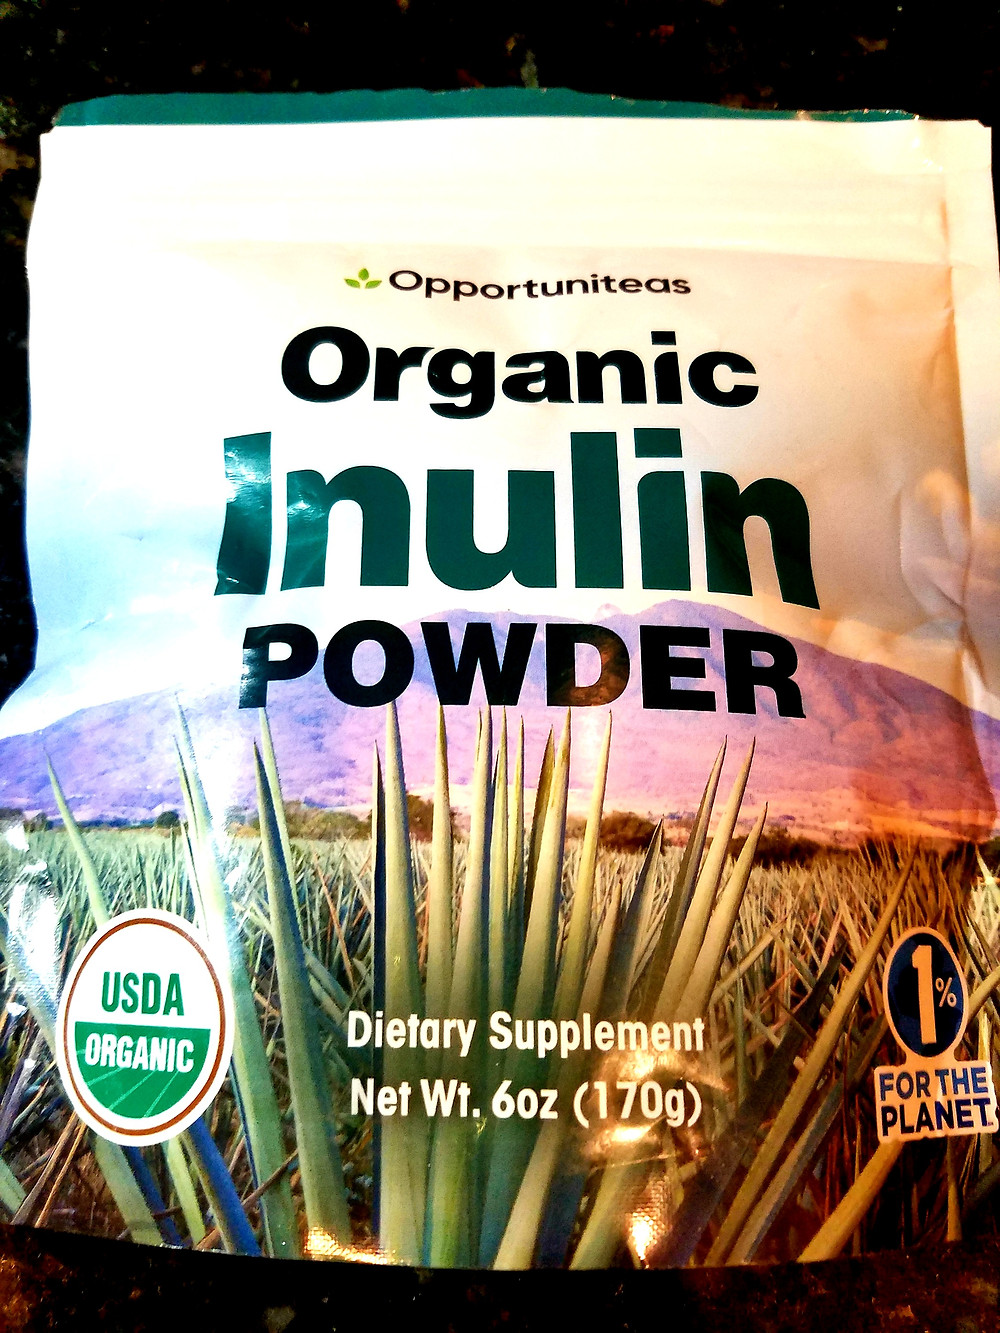 Opportuniteas Organic Inulin Powder - Prebiotic Super Fiber